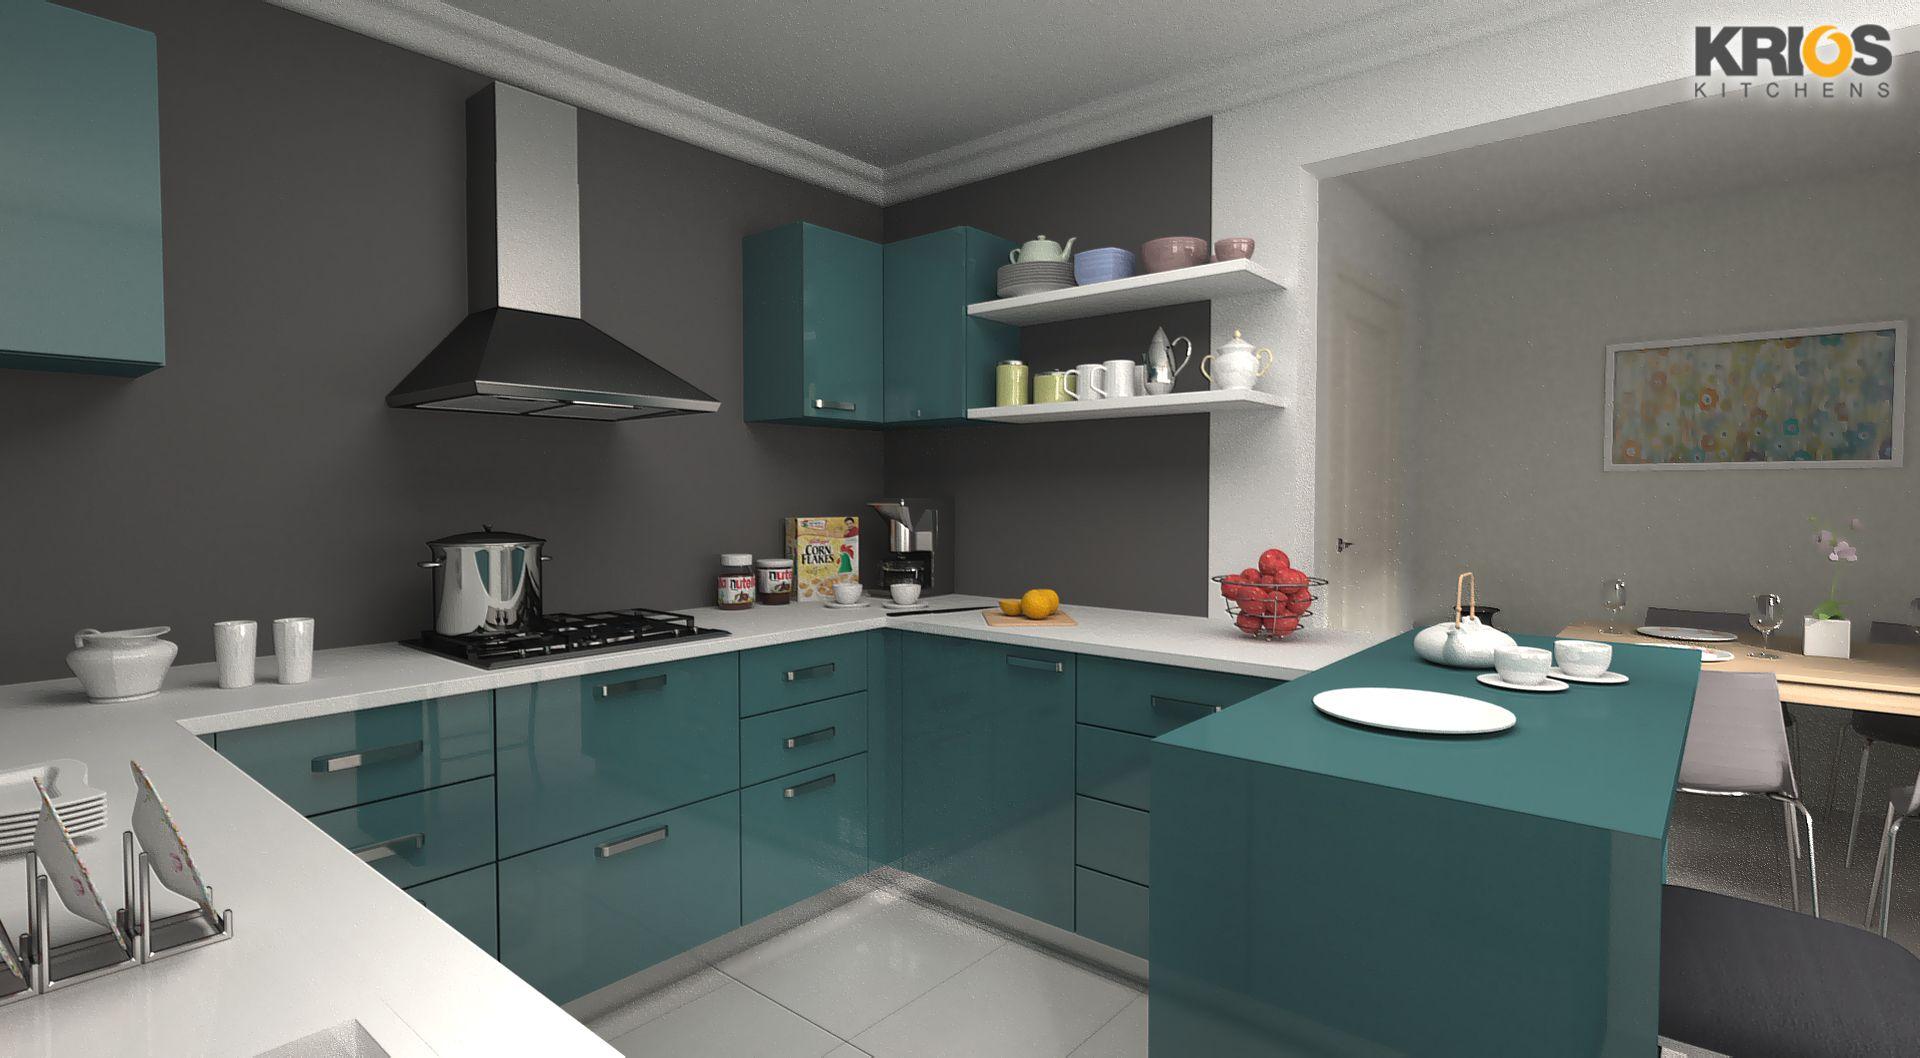 16 U Shape Modular Kitchen Design 3 U Shaped Modular Kitchen - Modular Kitchen U Shaped Design